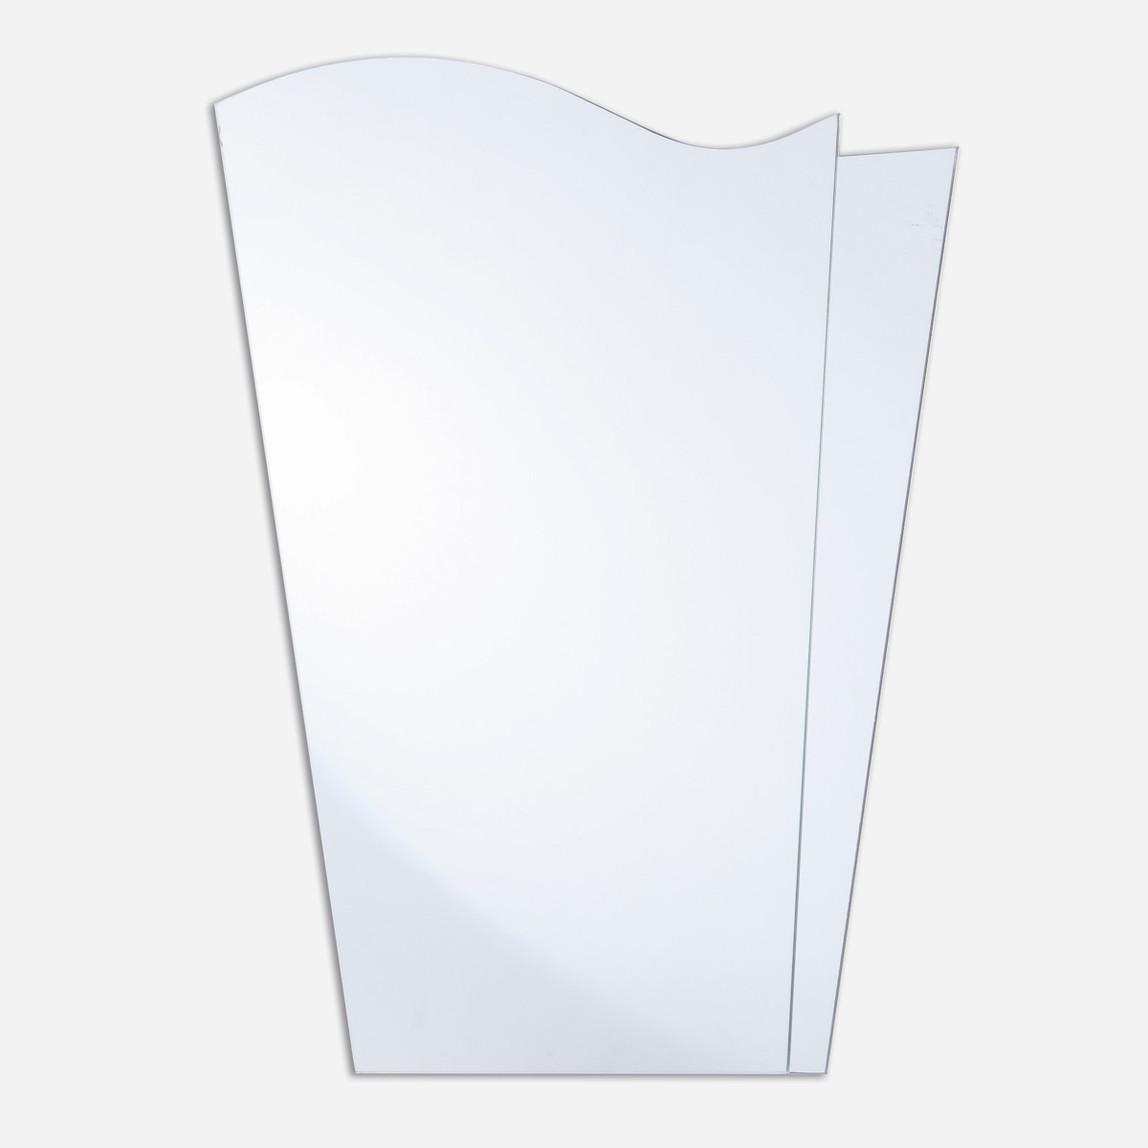 Pirizmatik Rodajlı Çift Cam Ayna